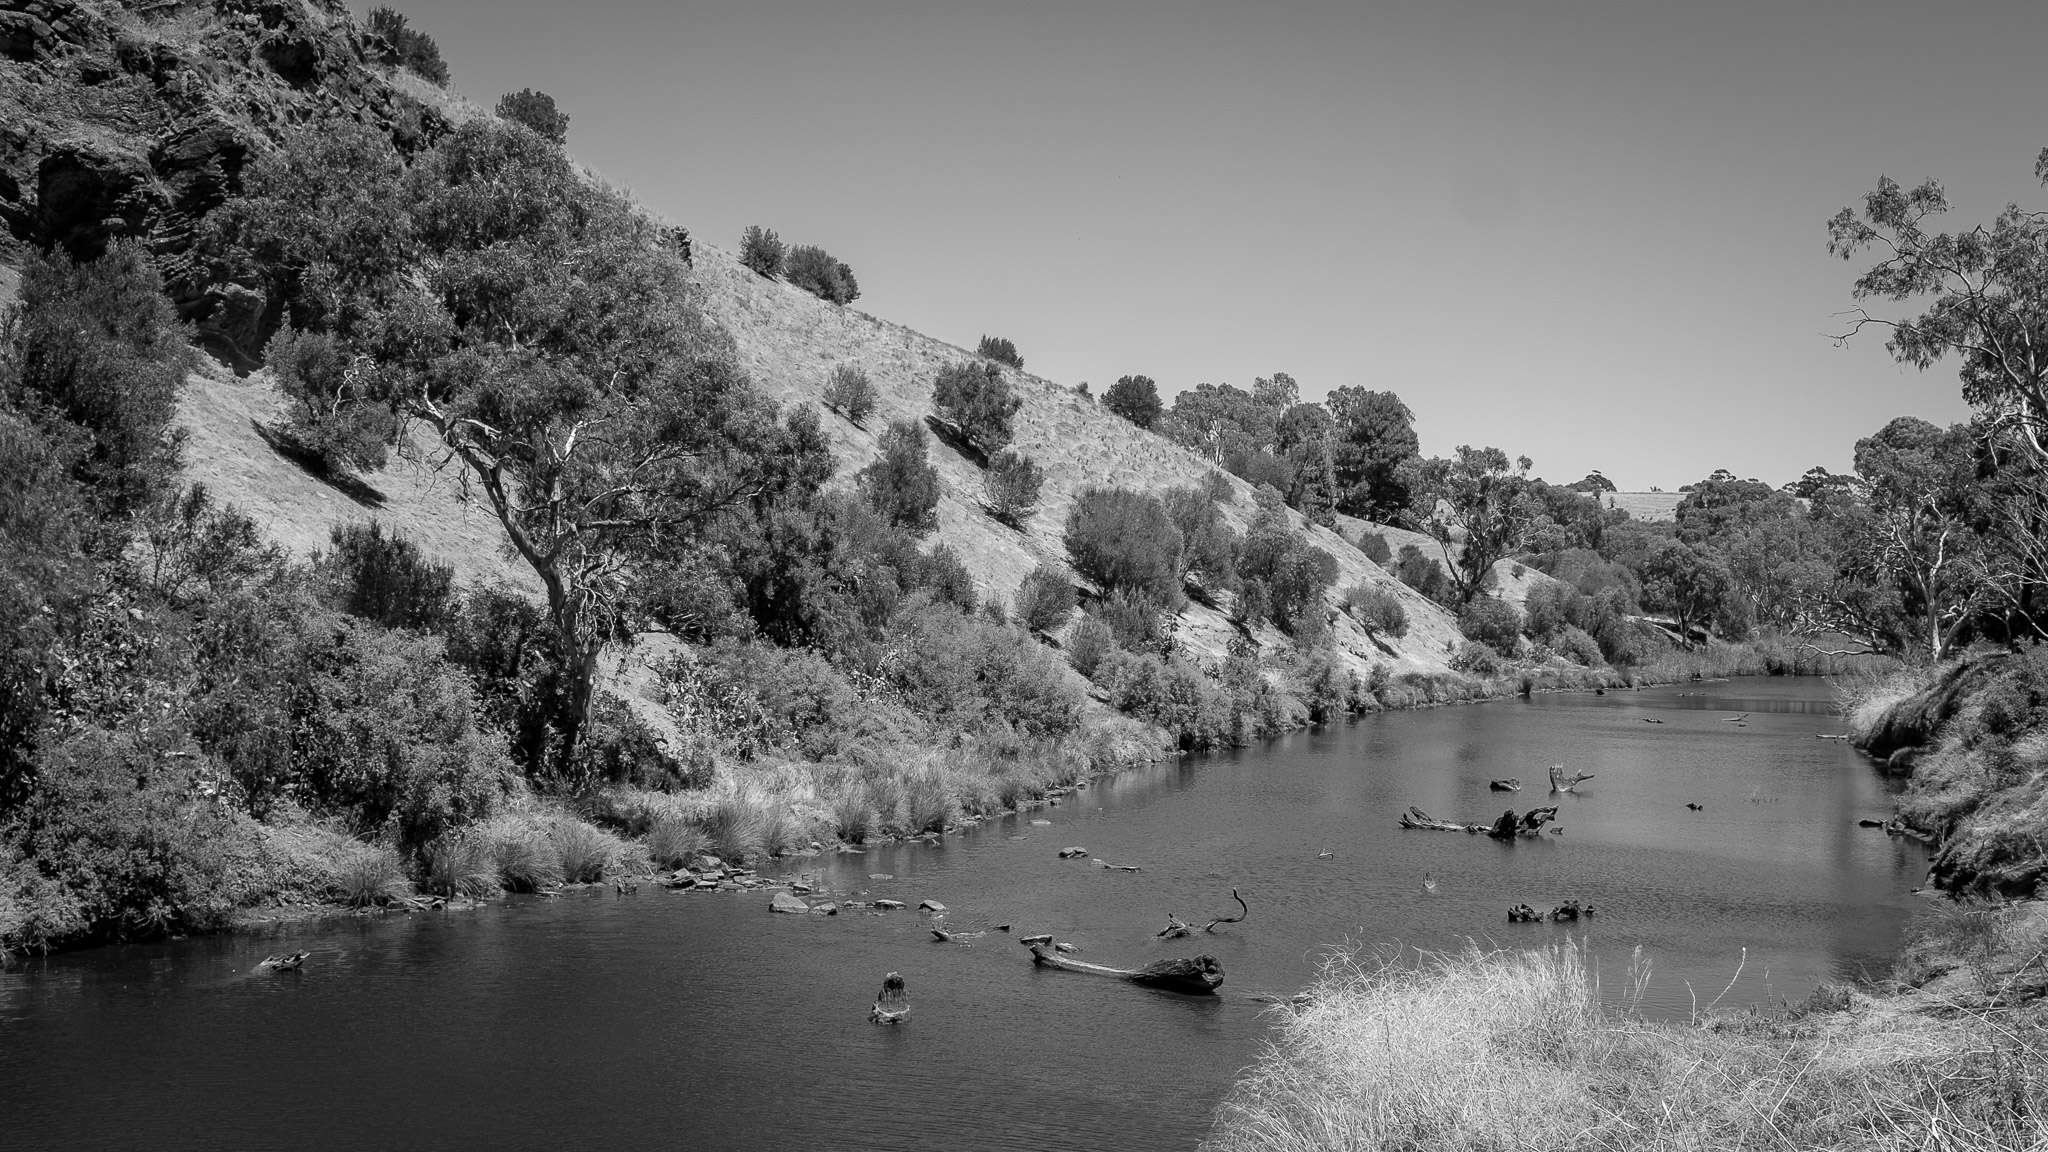 River scene at Old Noarlunga, South Australia